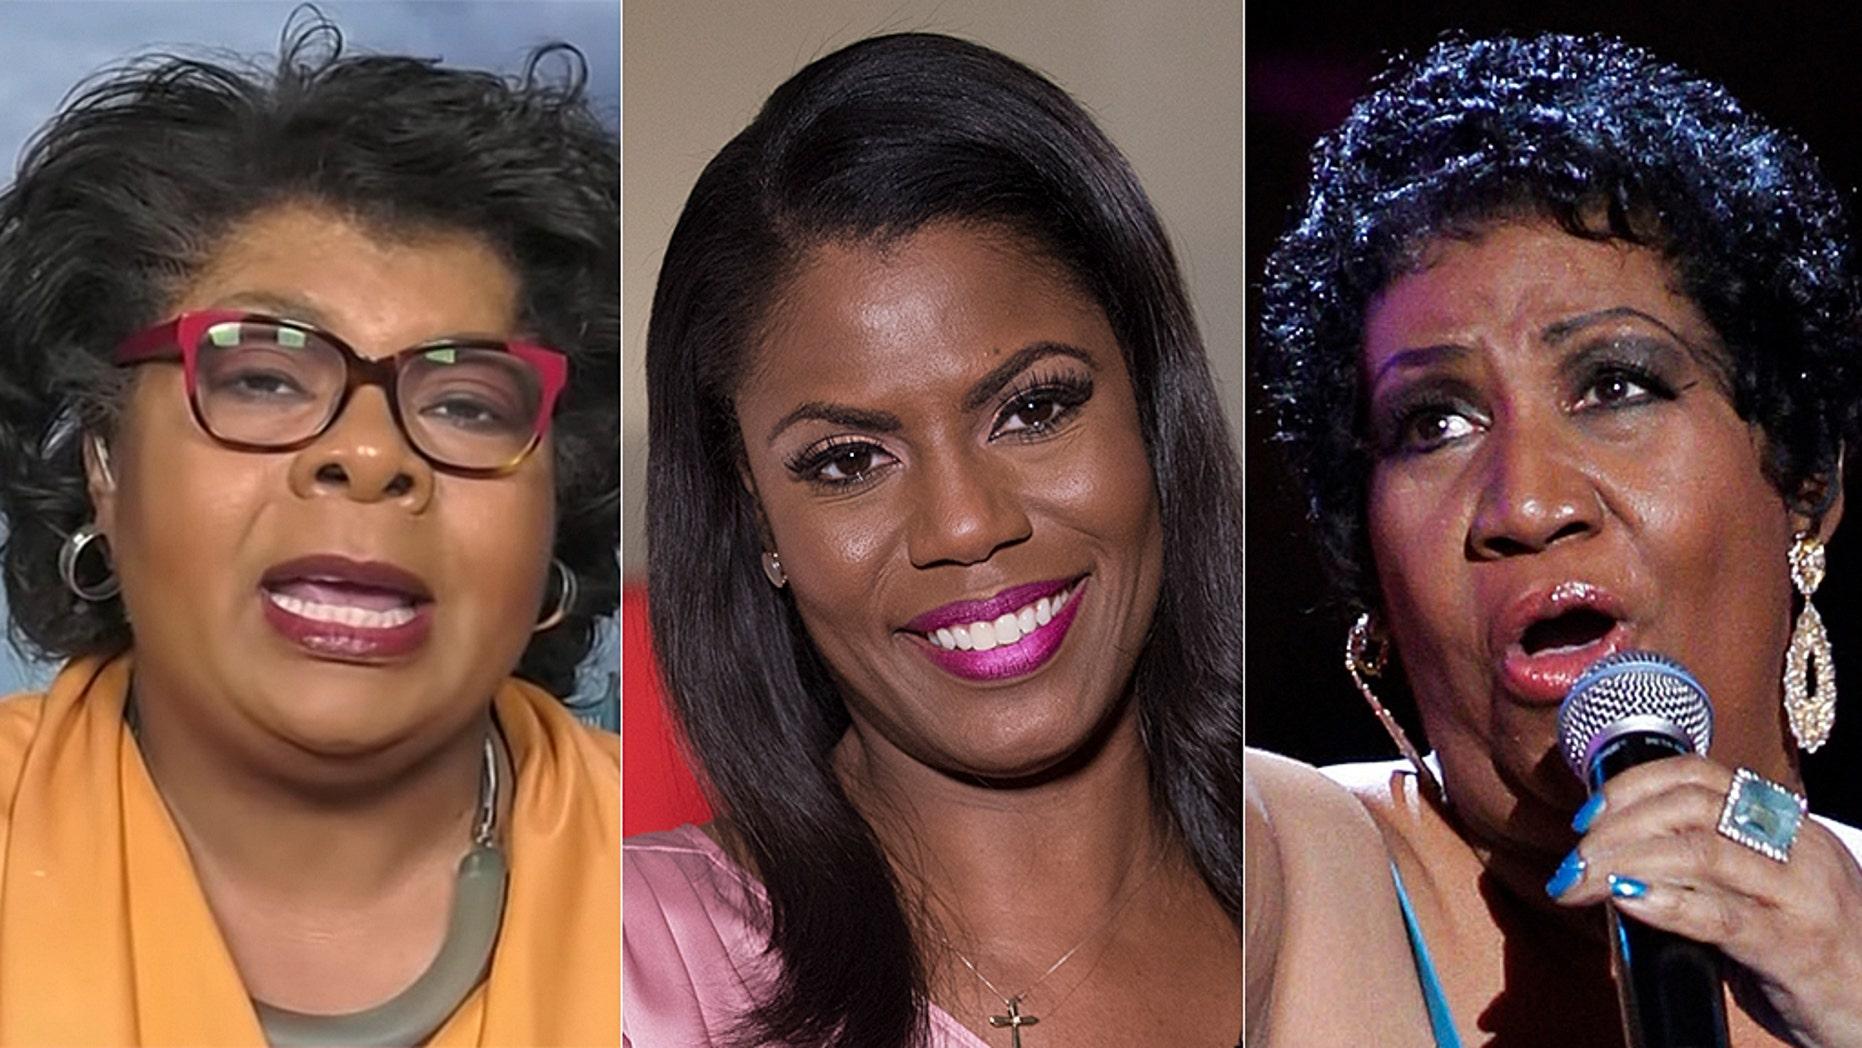 CNN star April Ryan said Omarosa Manigault Newman was vindictive about Aretha Franklin's failing health.